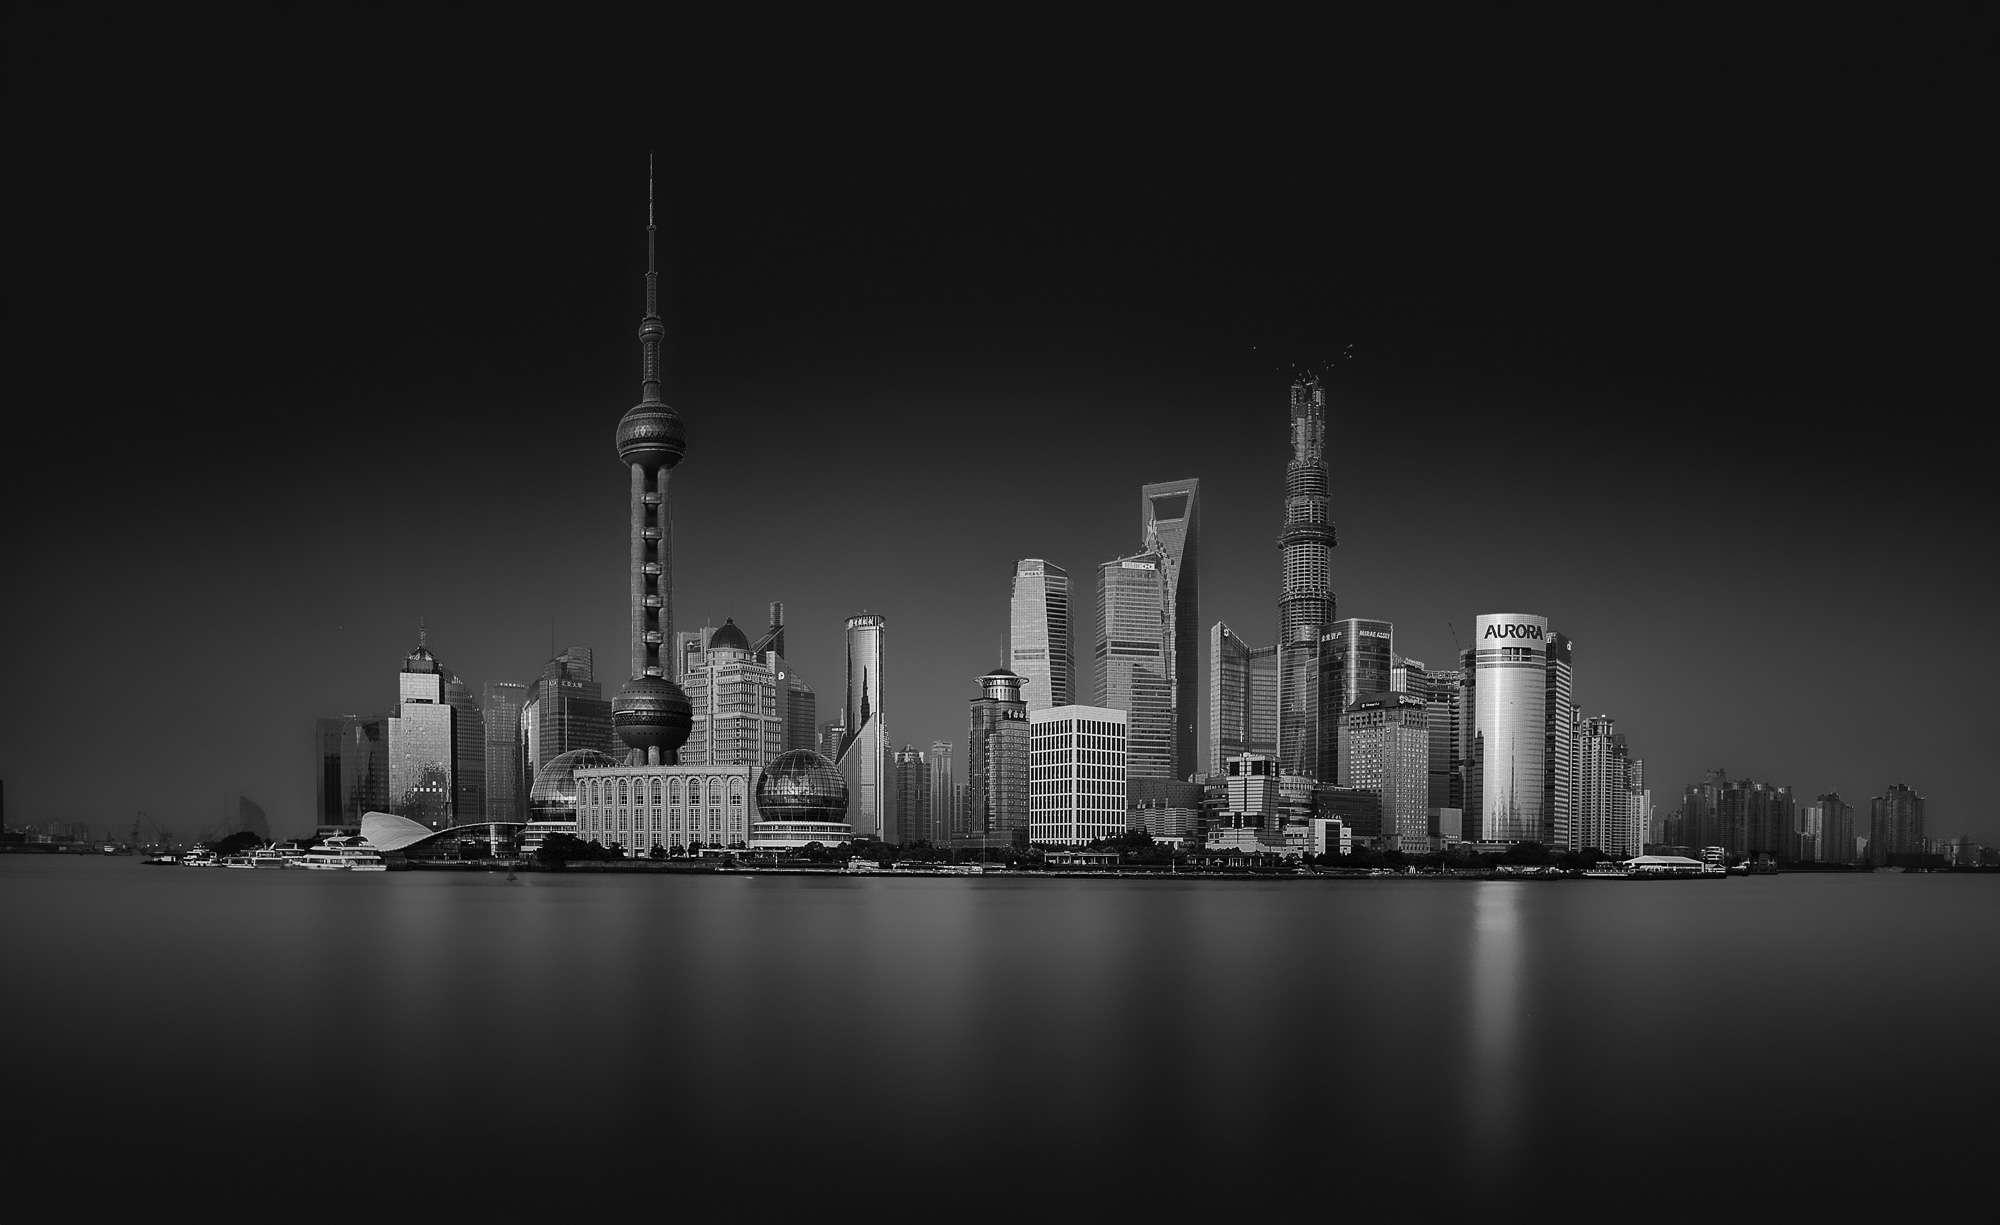 Stefan Schilbe - Shanghai in Black and White